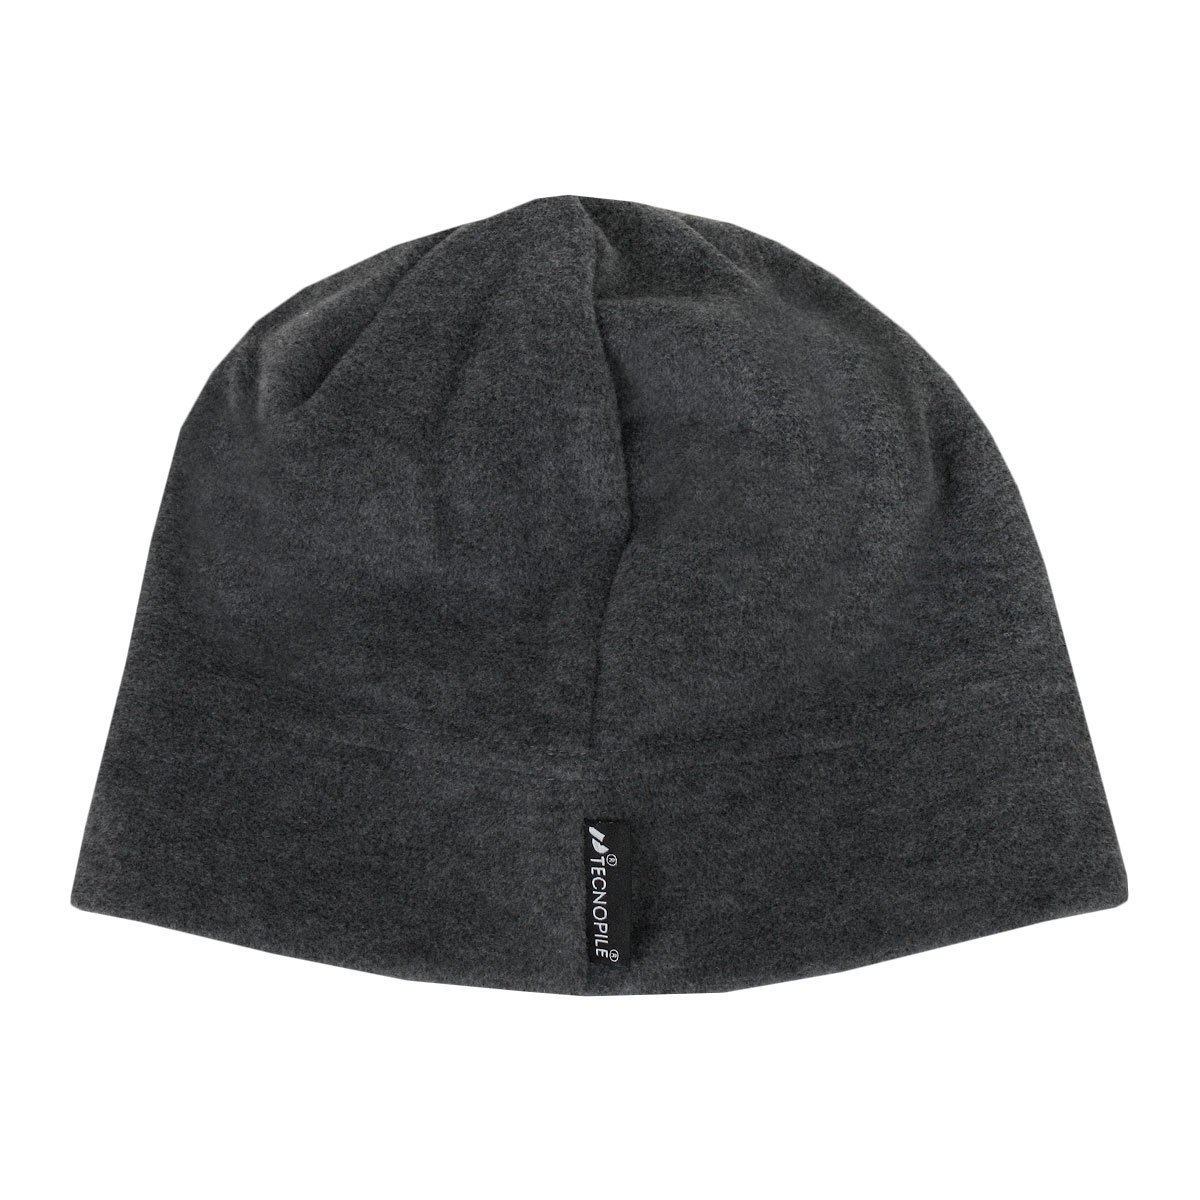 Jack Wolfskin Unisex Real Stuff Lightweight Breathable Beanie Hat  adb285b3498